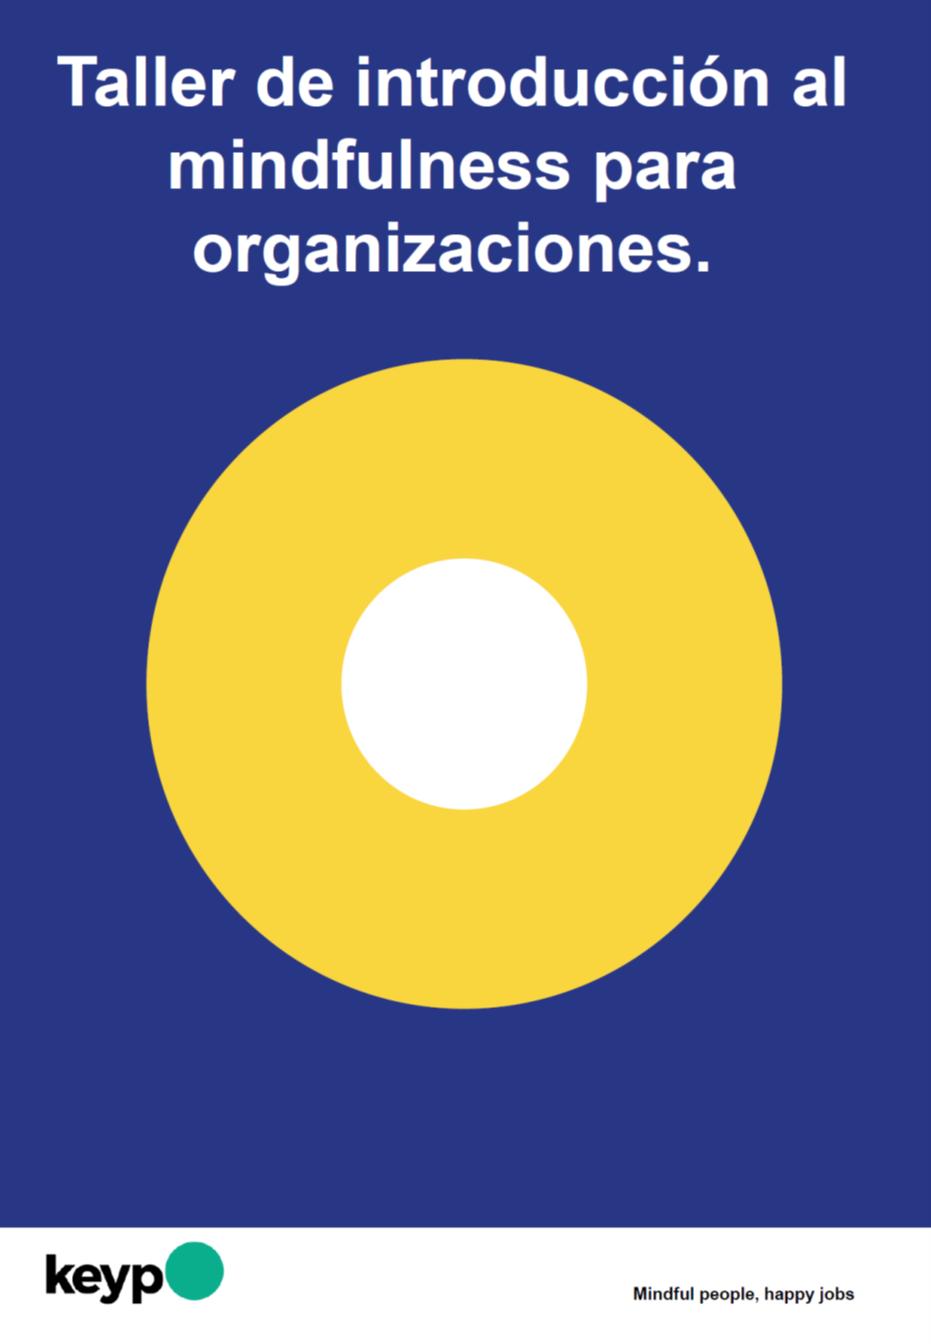 Taller intro mindfulness empresas.png